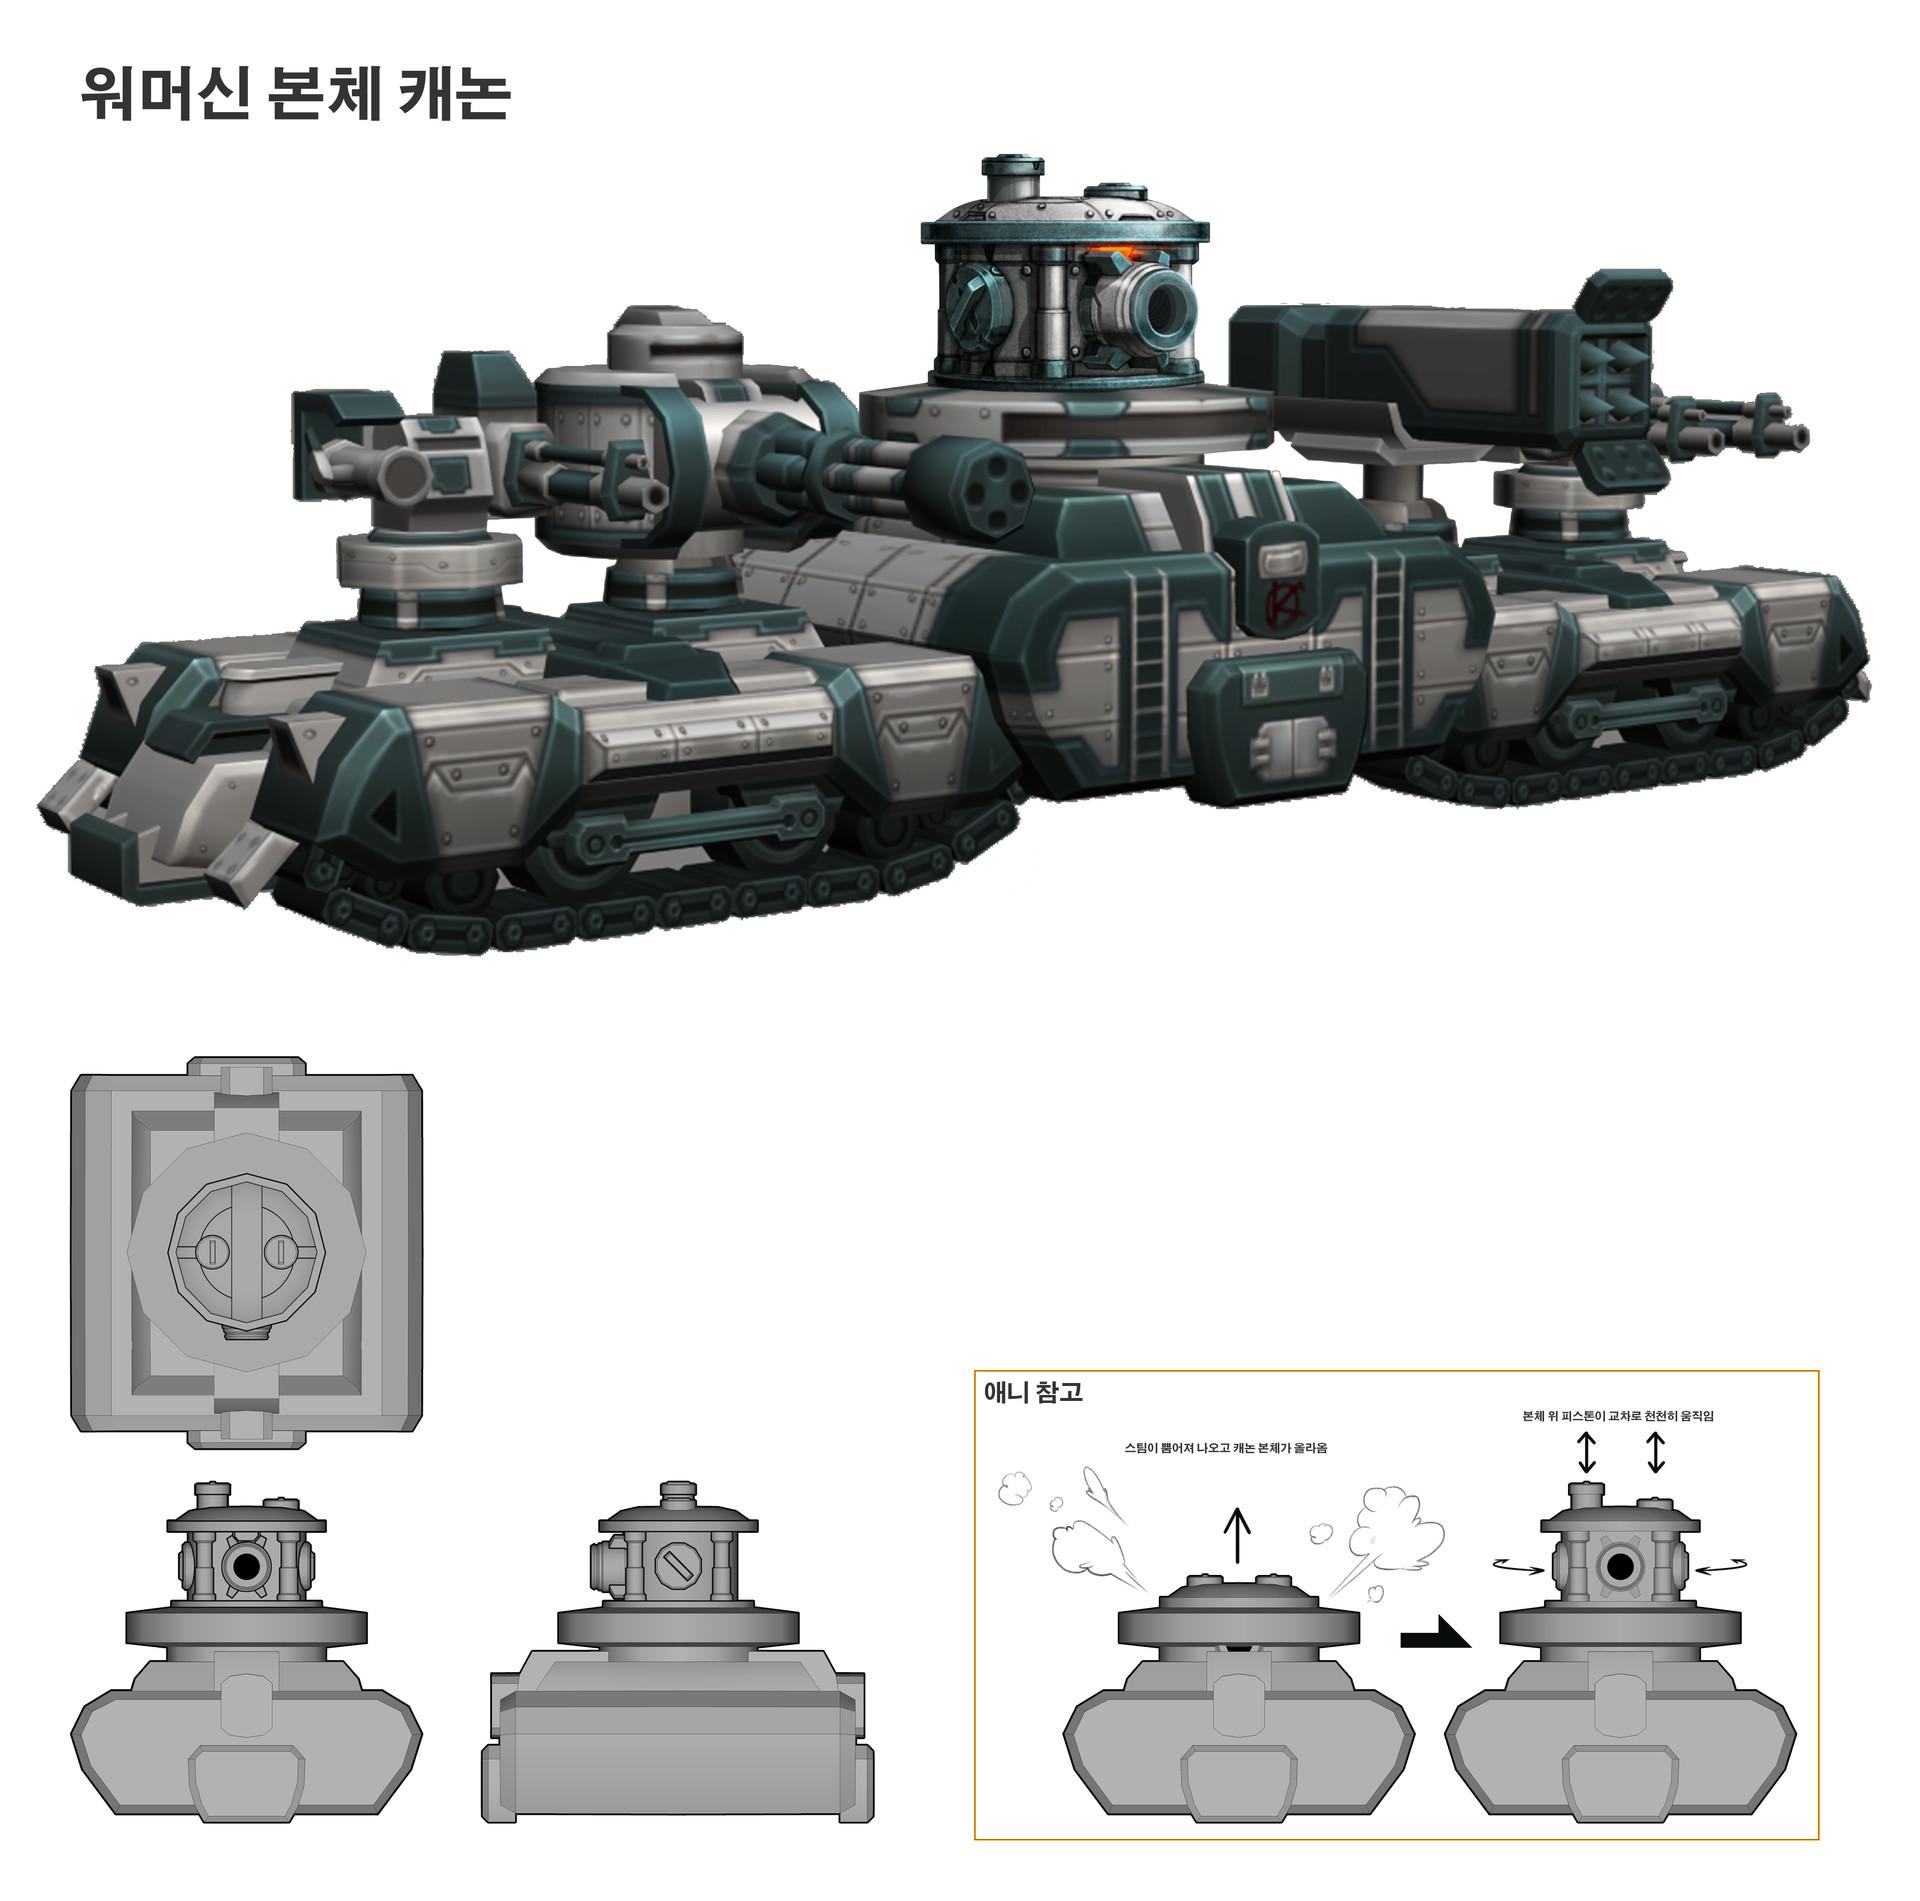 R o iaki boss1 warmachine cannon modi